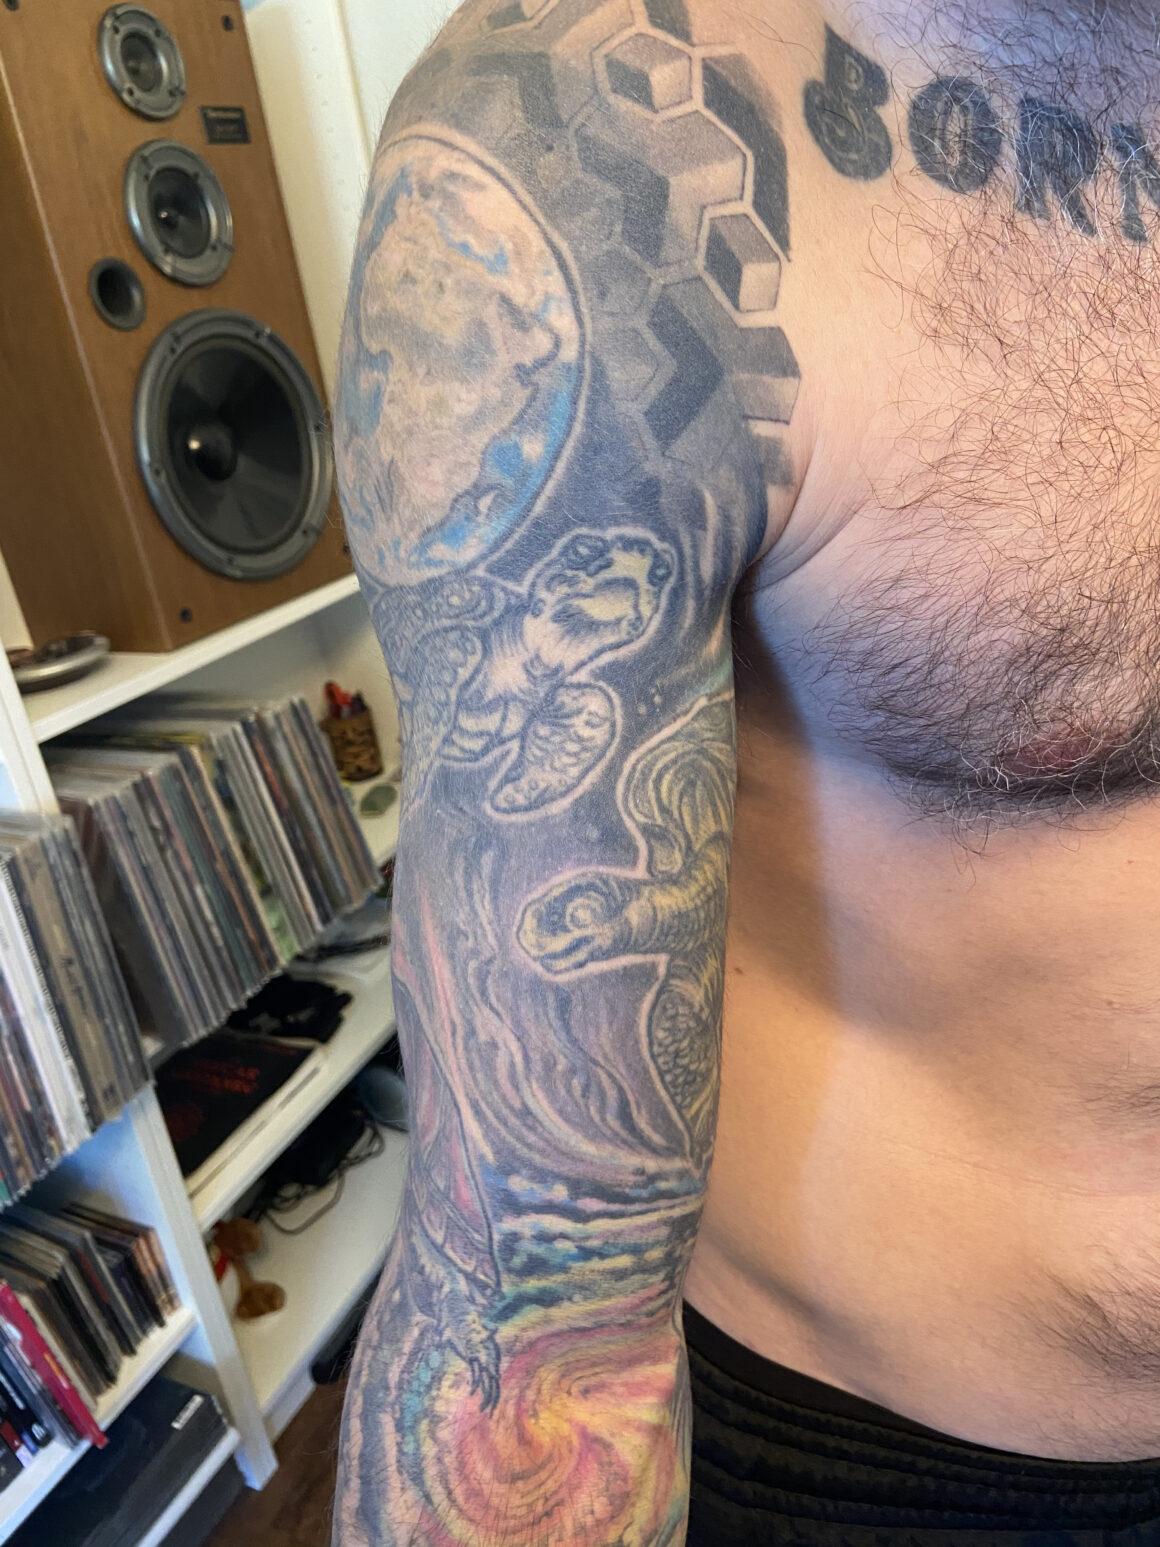 Nate Garrett (Spirit Adrift) tattoos